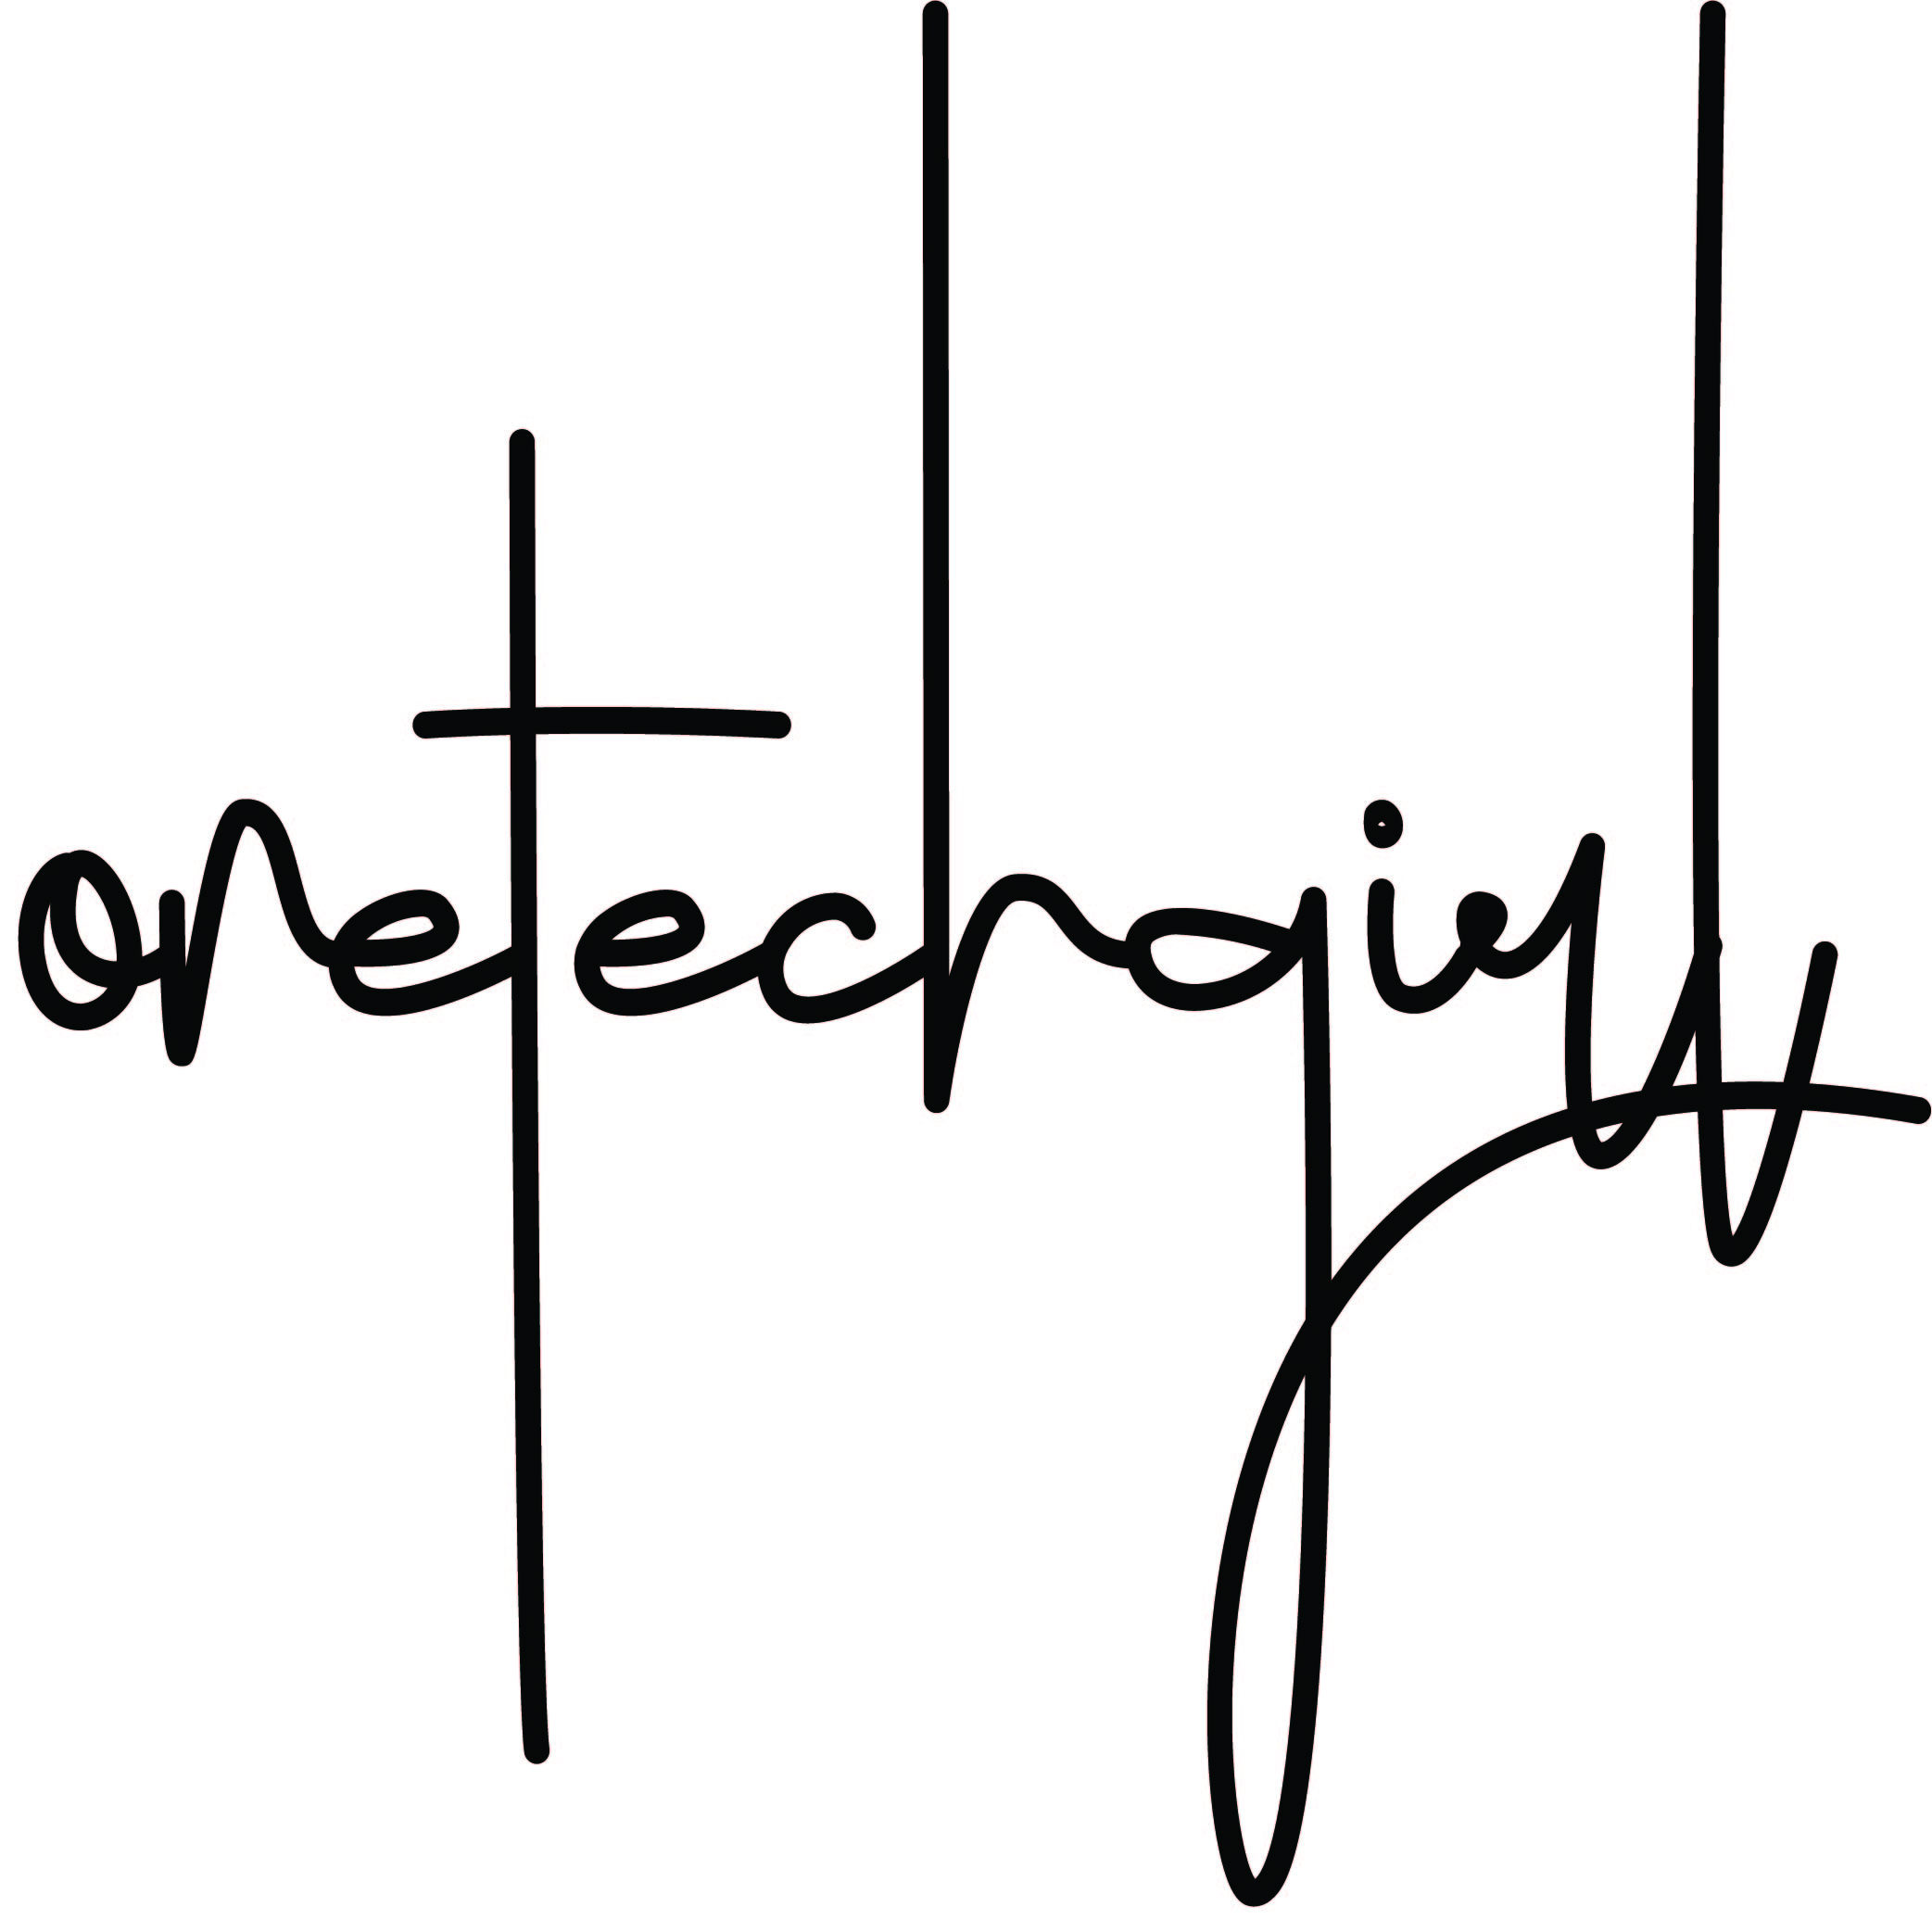 OneTechGirl - Technology & Branding